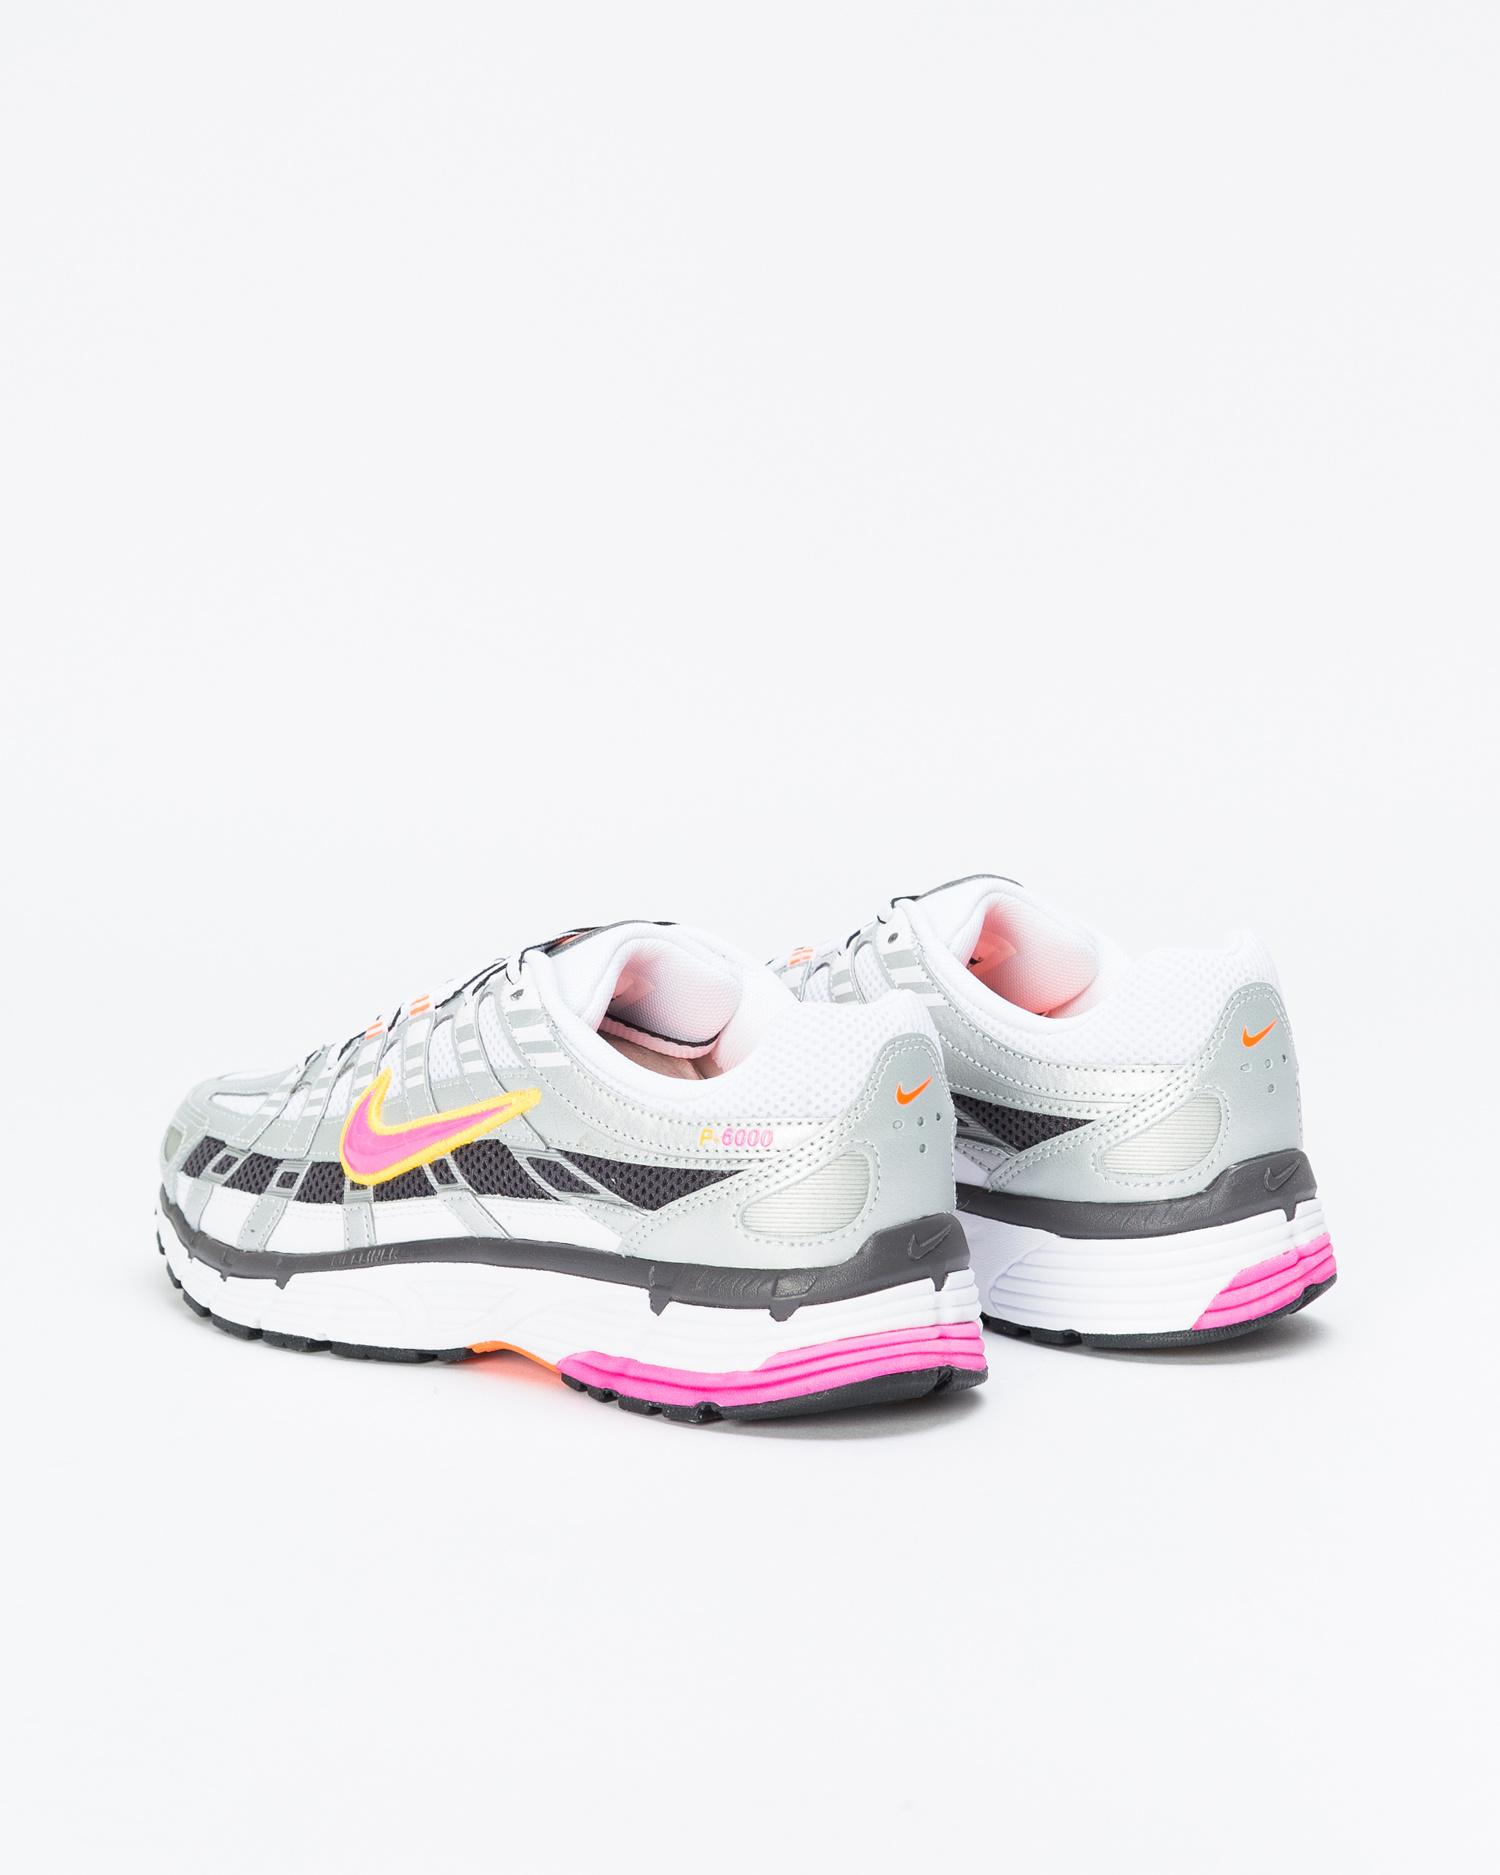 Nike P-6000 white/laser fuchsia-mtlc platinum